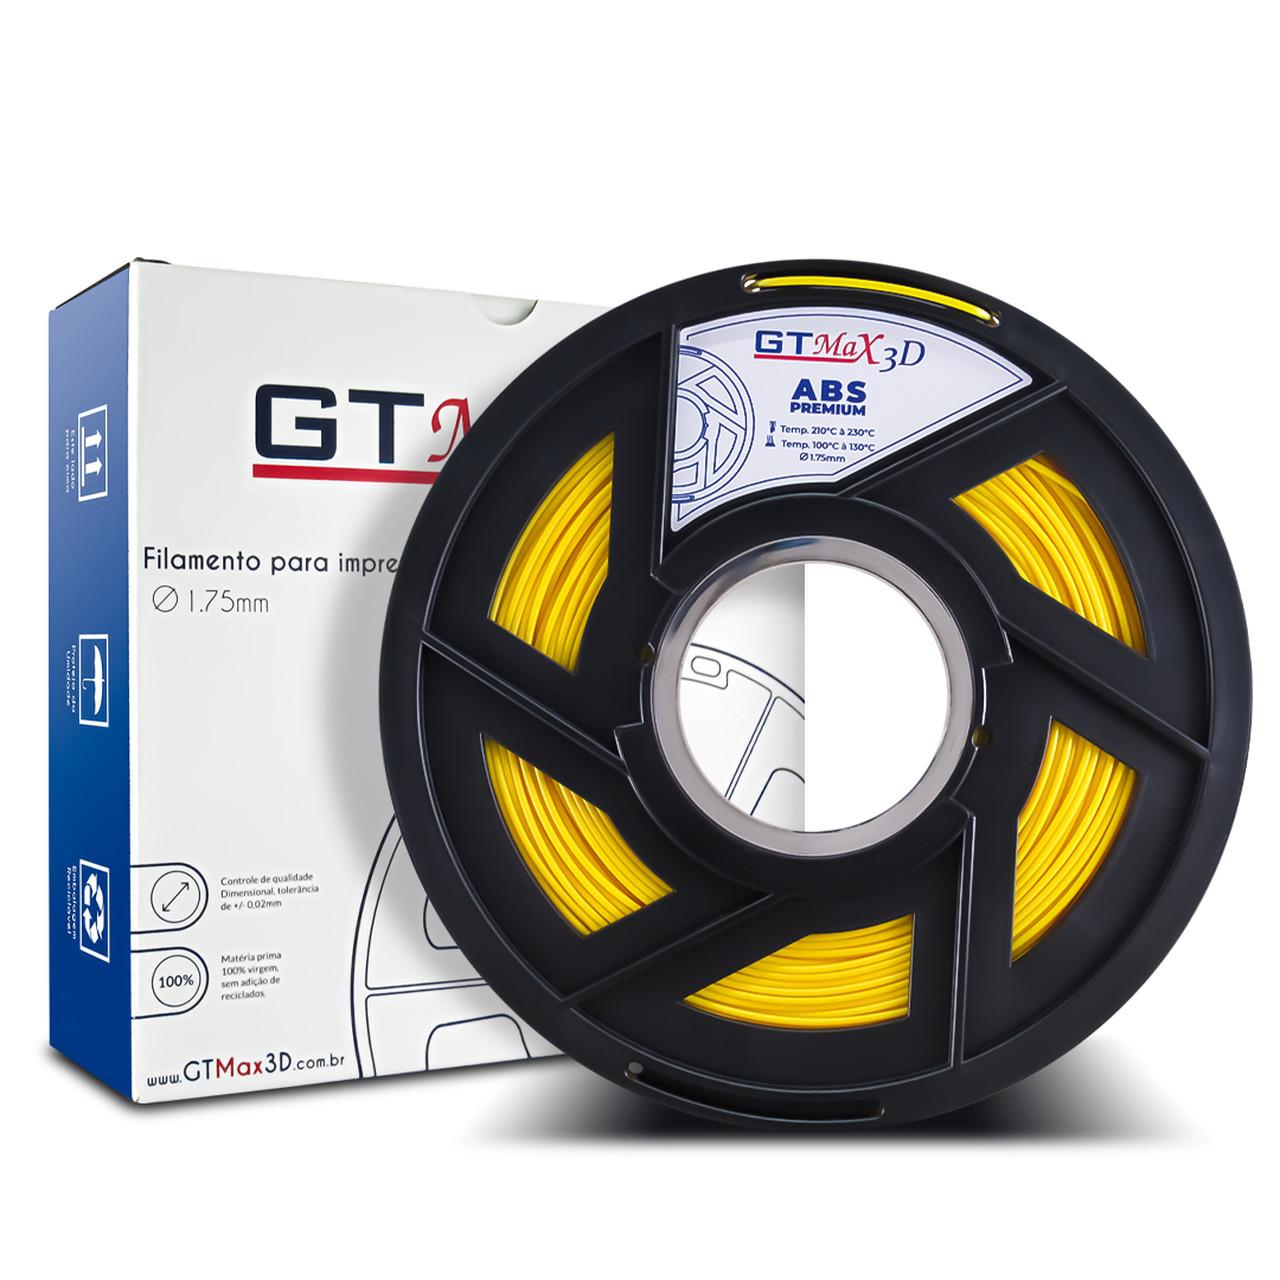 Filamento ABS - Amarelo - Premium - GTMax 3D - 1.75mm